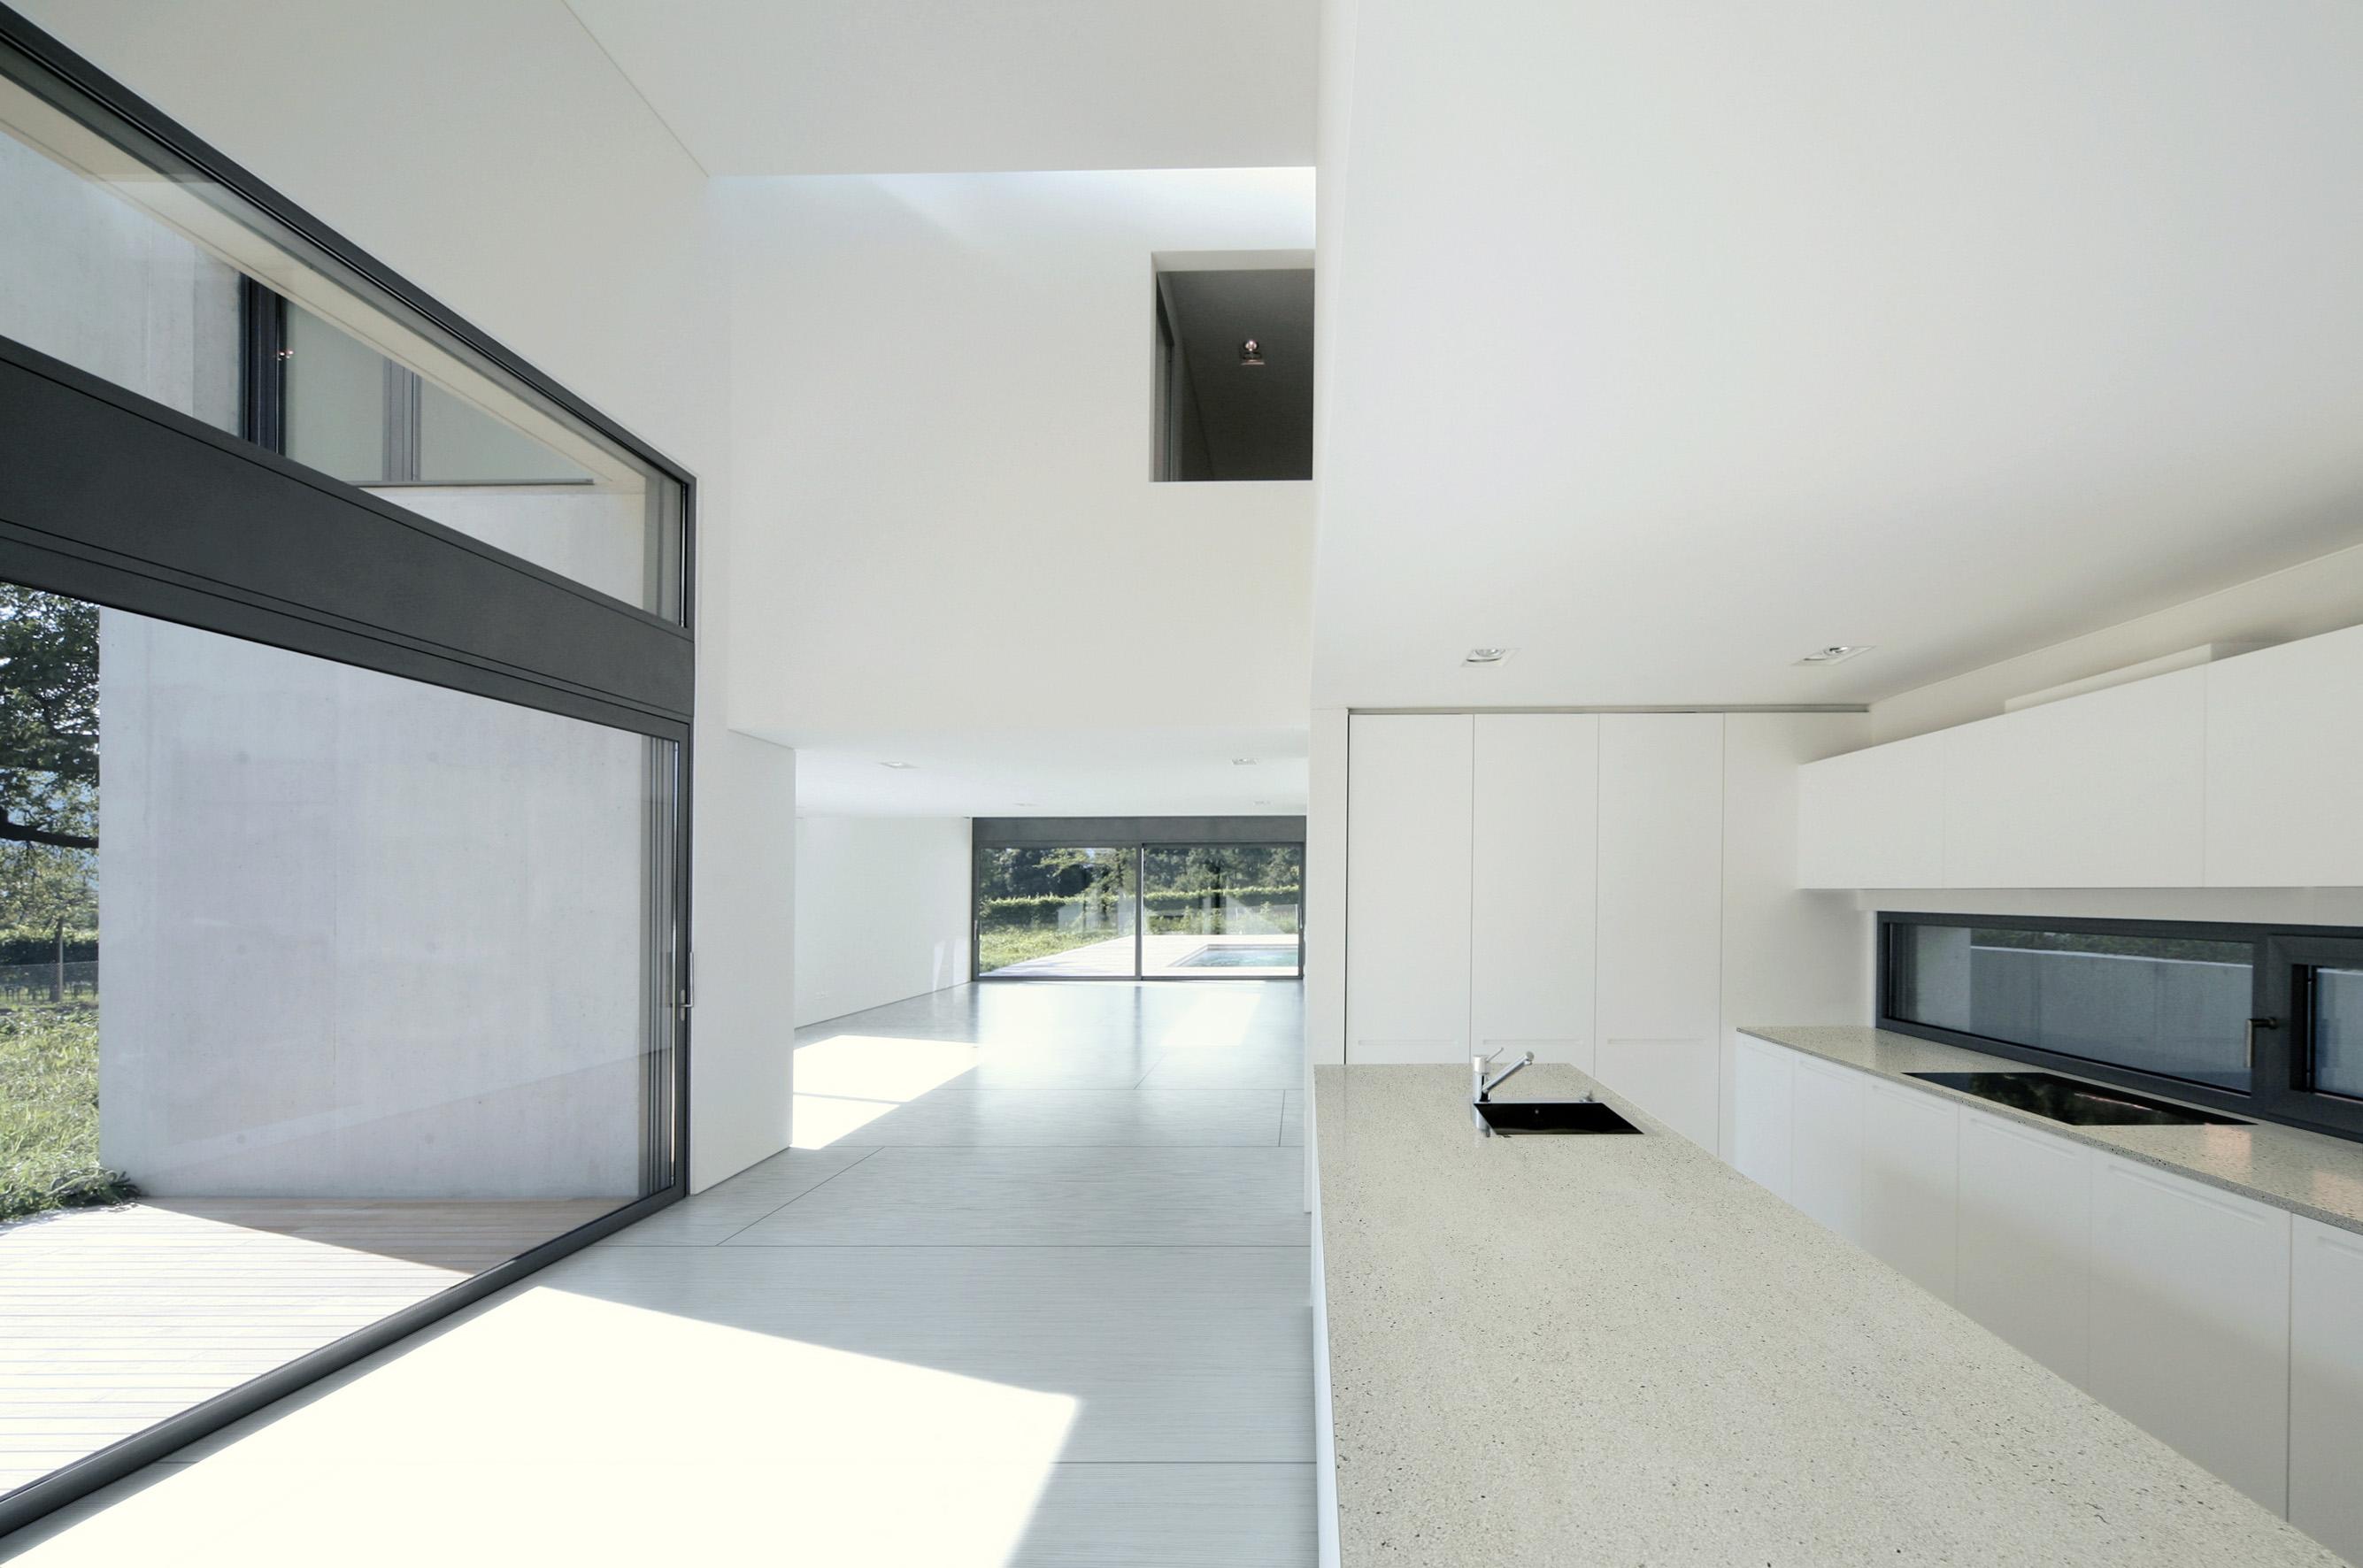 Moderne keuken met werkblad met betonlook. Materiaal Dekton Strato via Arte